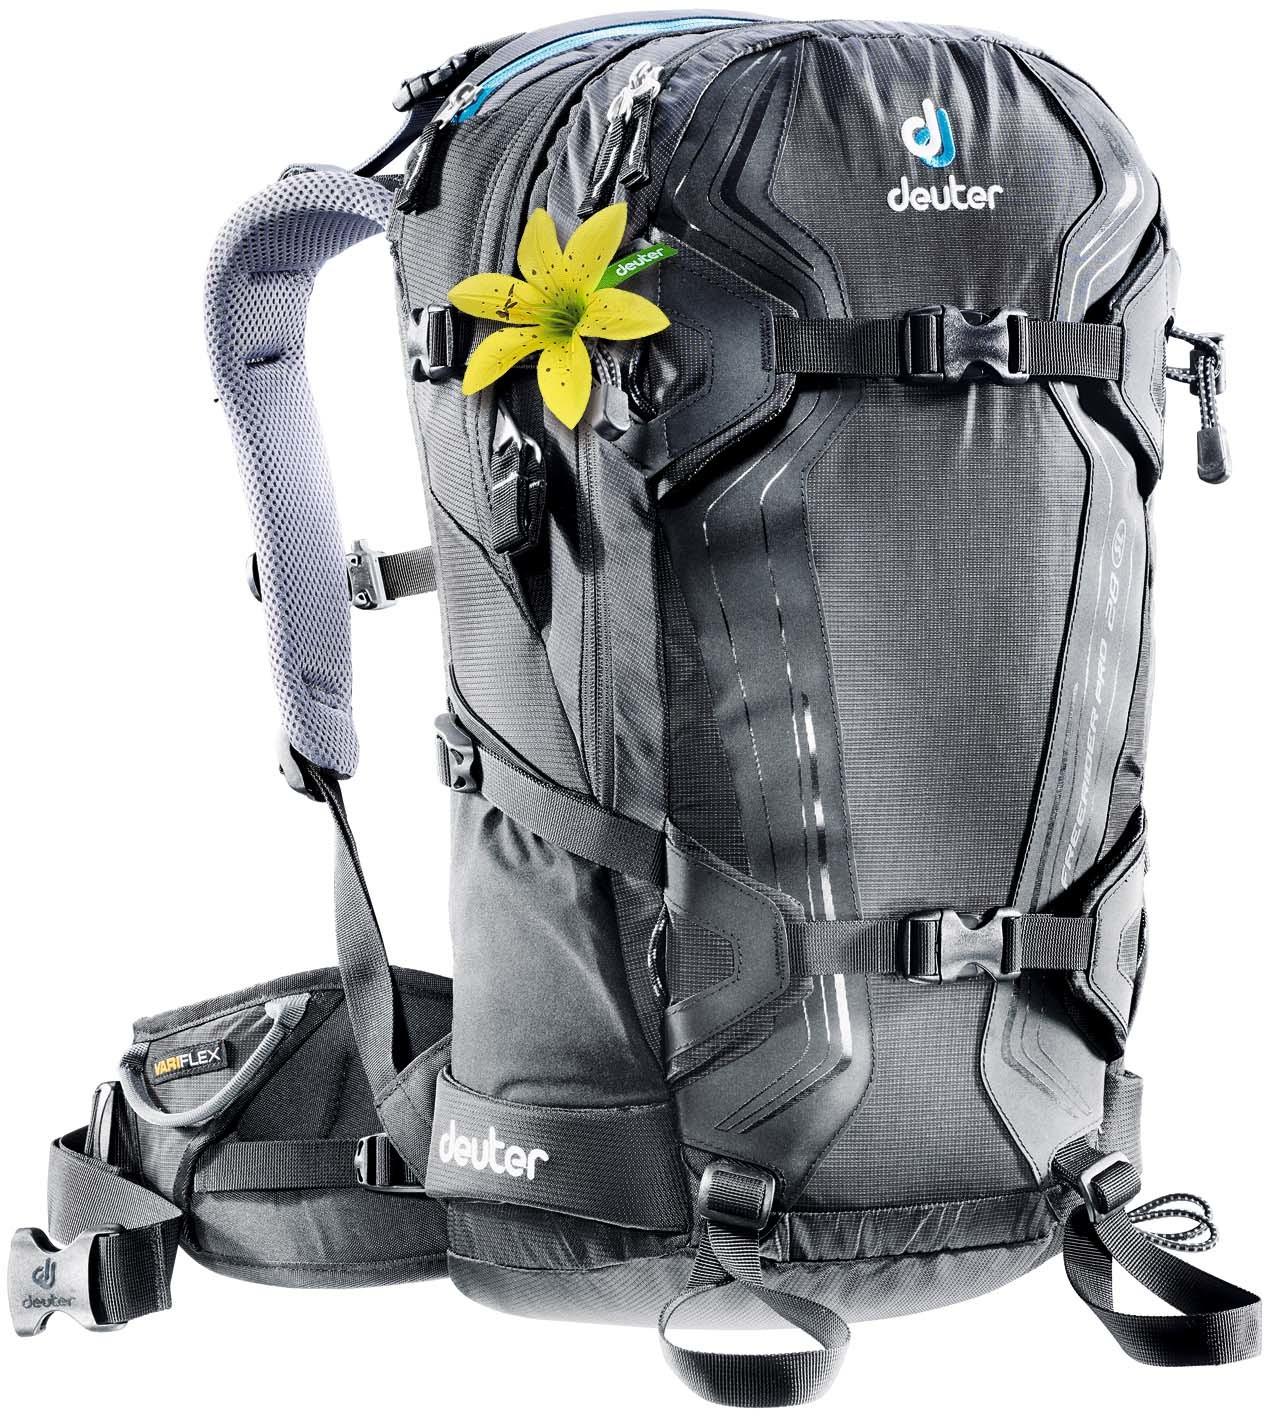 Зимние рюкзаки Рюкзак женский для сноуборда Deuter Freerider Pro 28 SL FreeriderPro28SL_7000_14.jpg